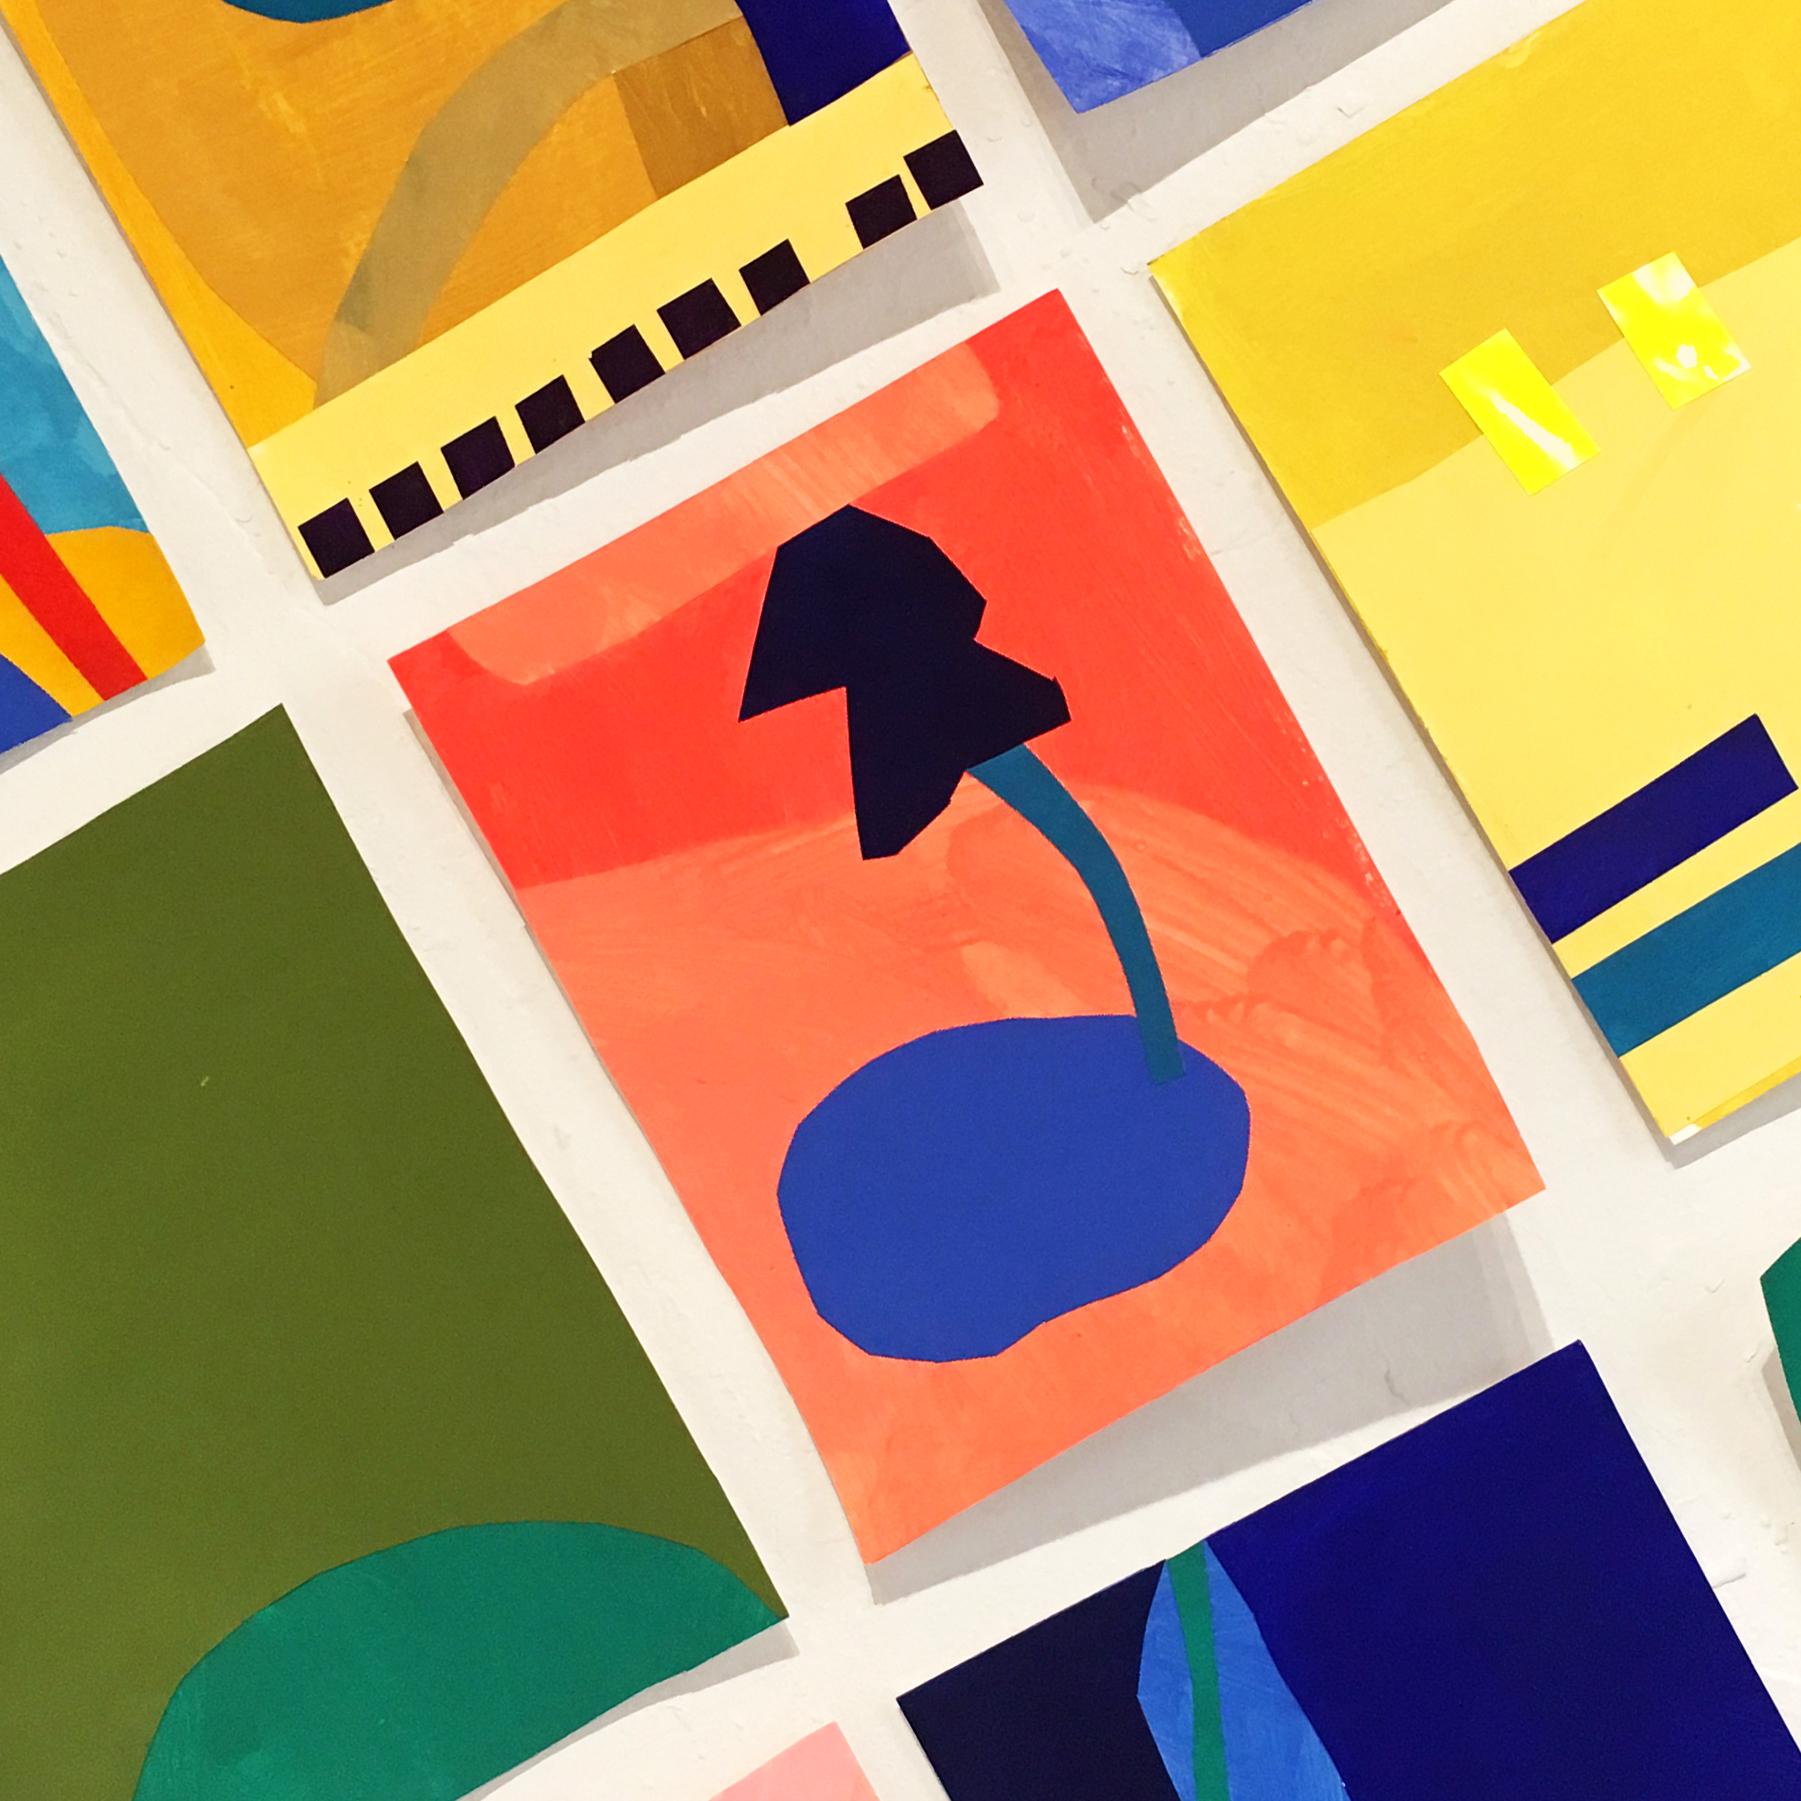 Gallery Space: Sophie Treppendahl & Adam Eddy